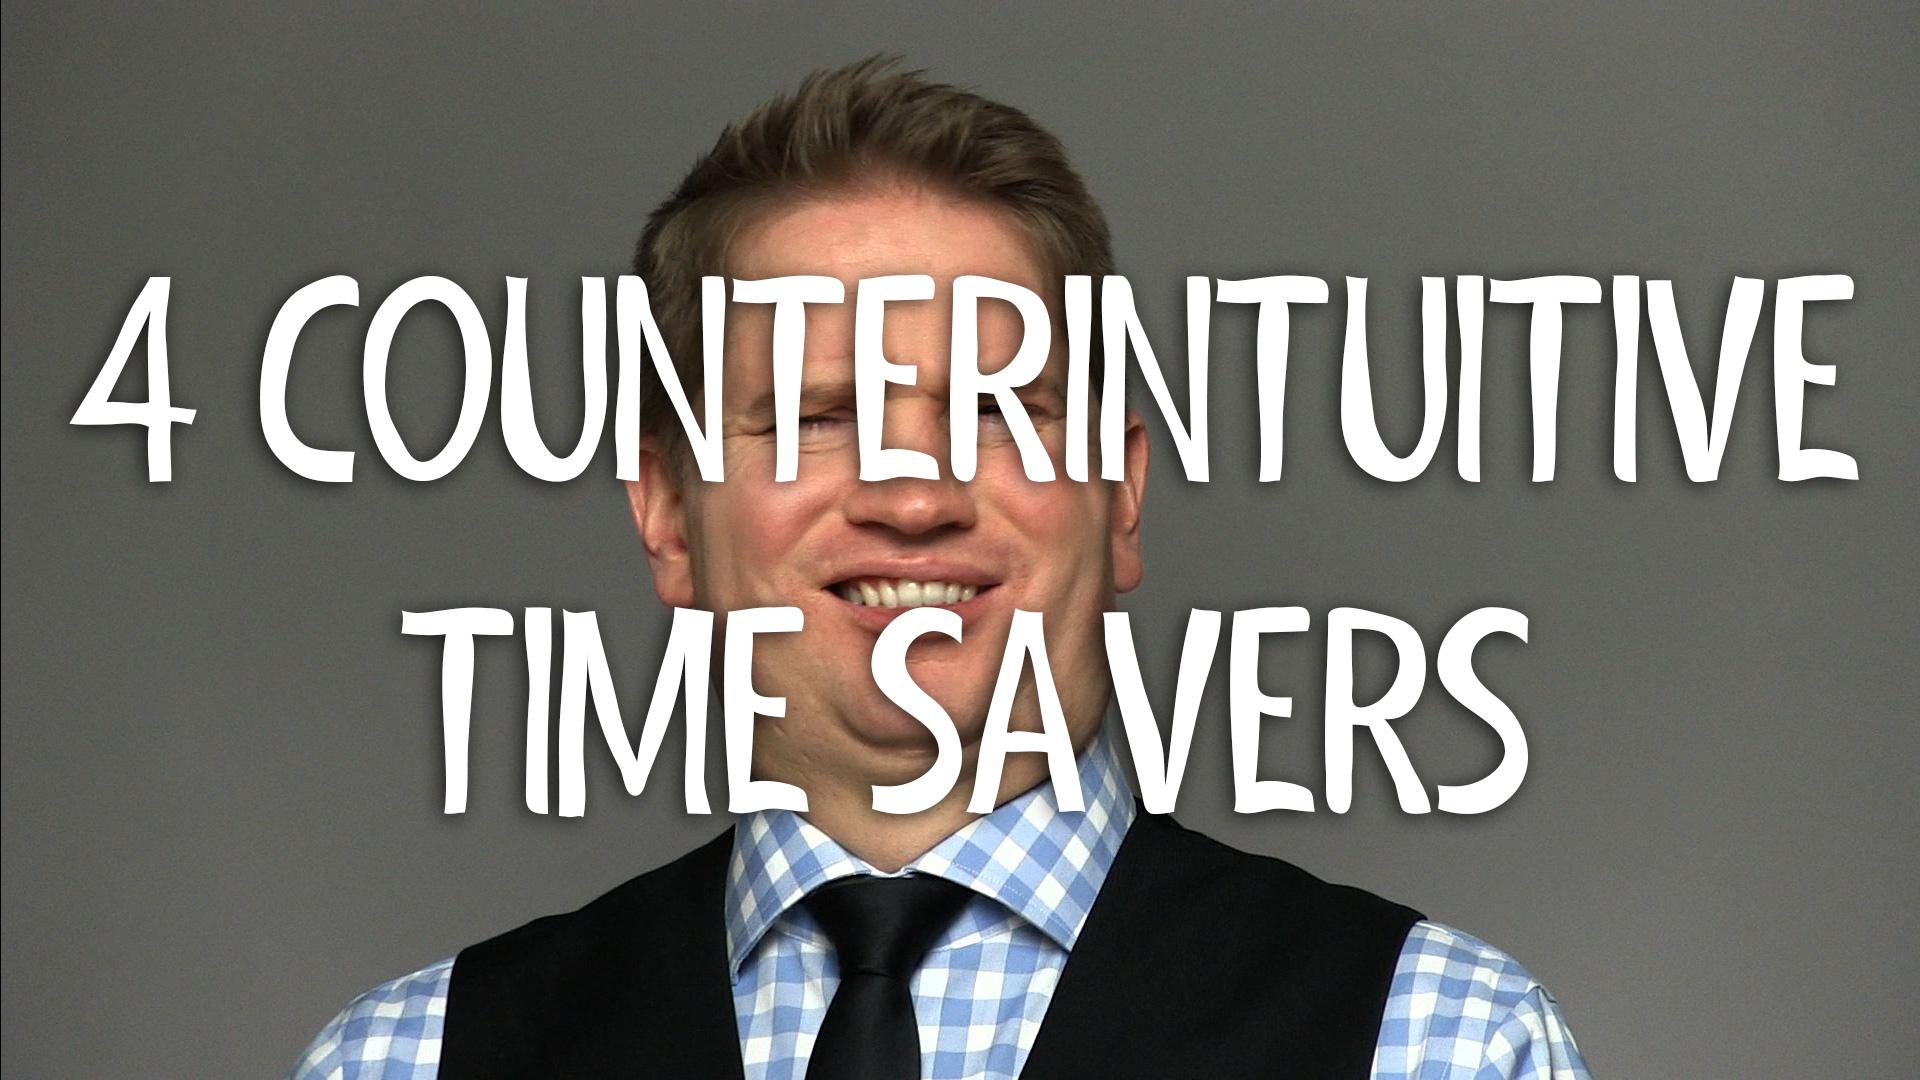 4 Counterintuitive Time Savers